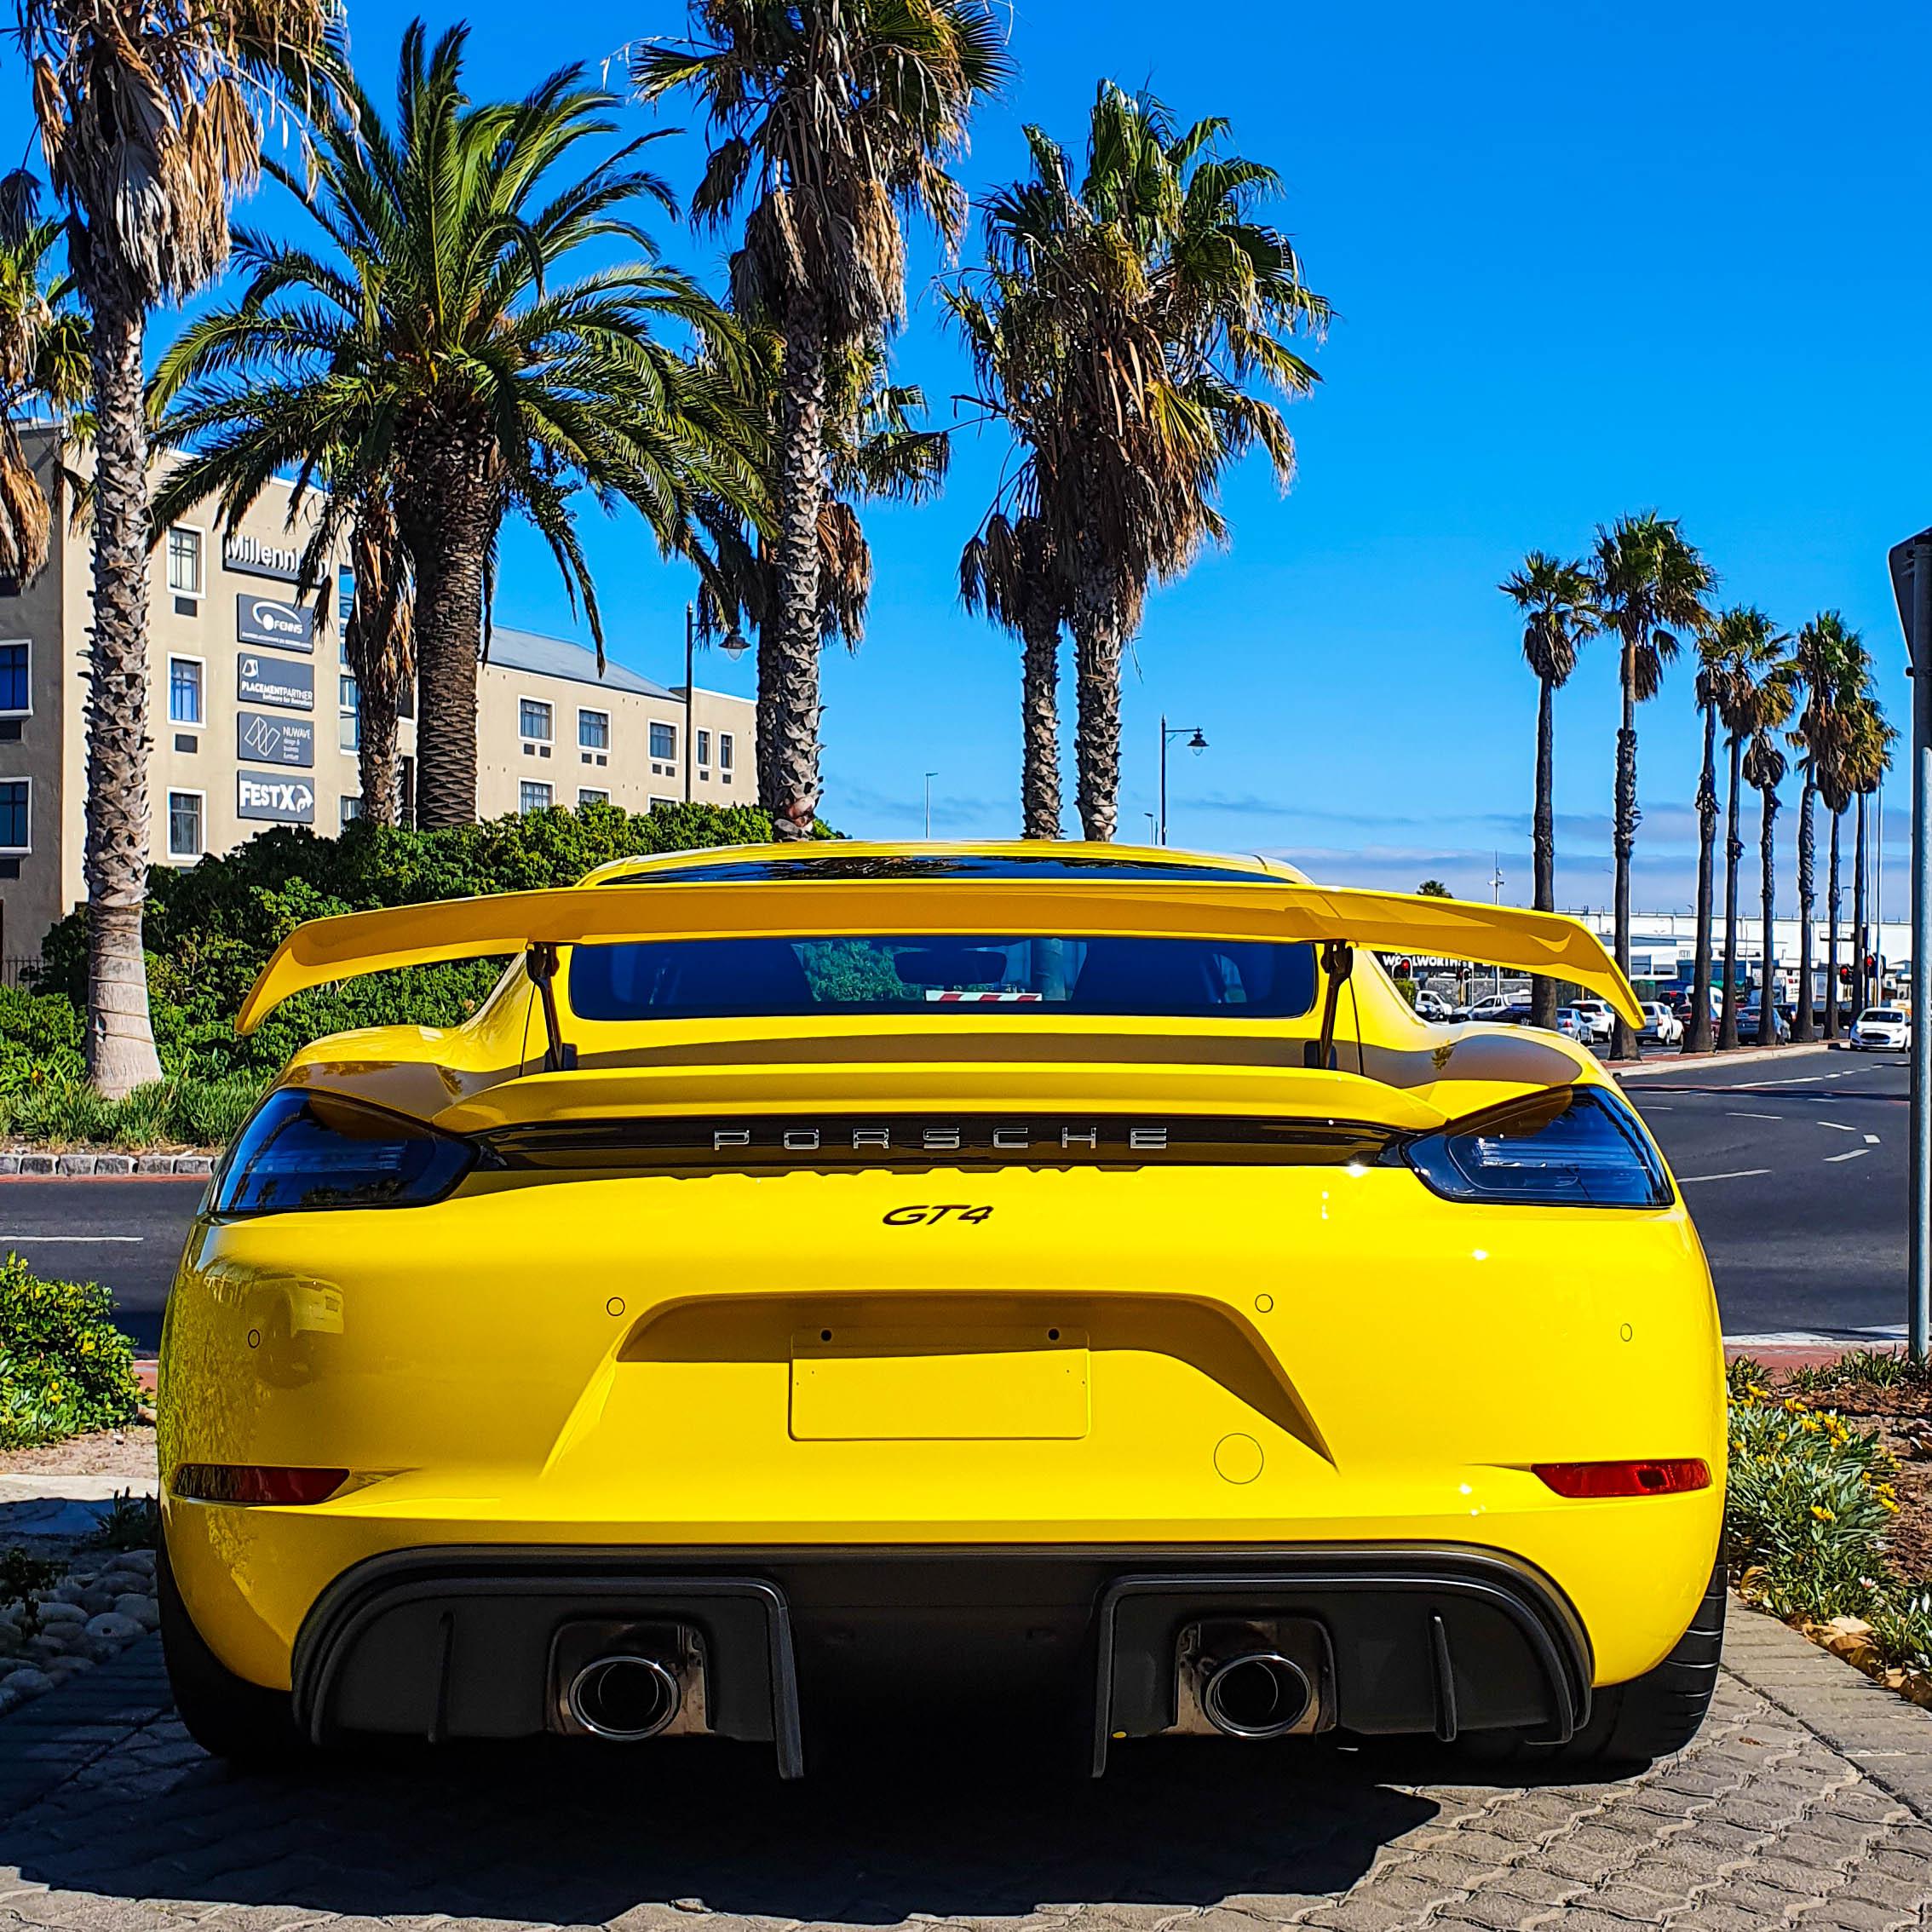 Ferrari F8 Tributo Yellow: #ExoticSpotSA Week 14 2020